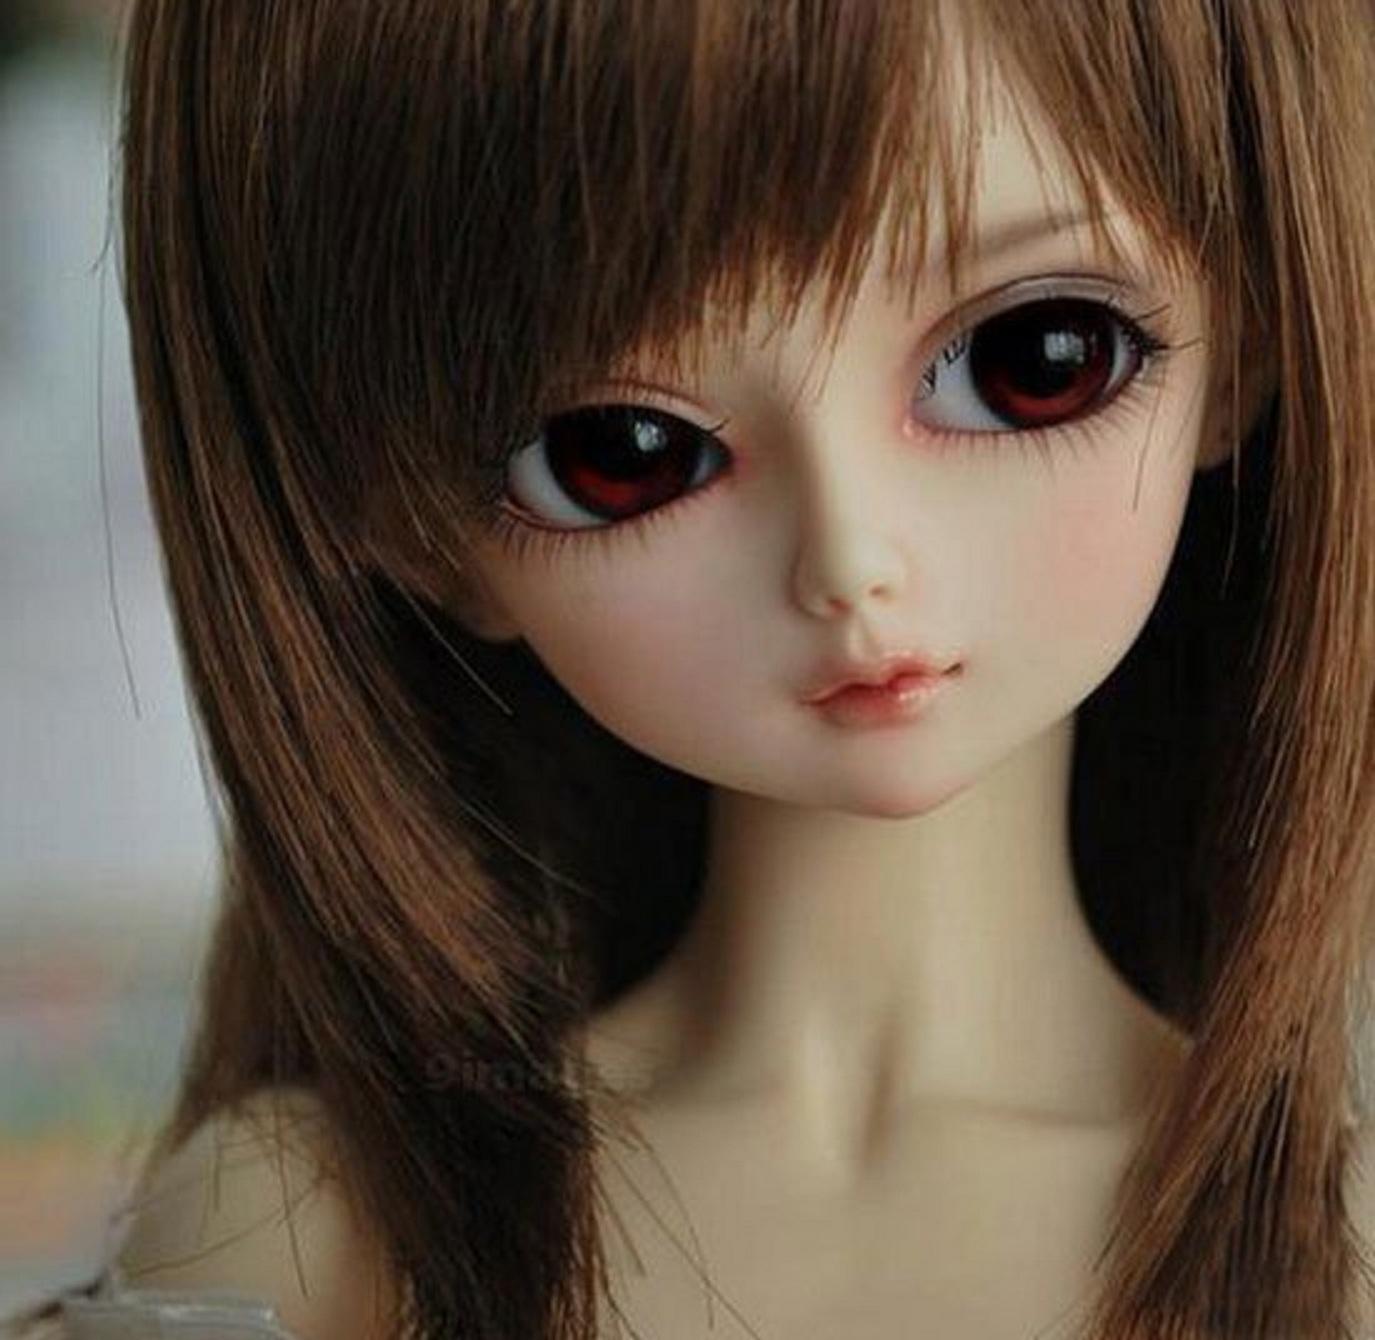 Barbie Wallpaper Hd 3d: 3d Doll Wallpaper